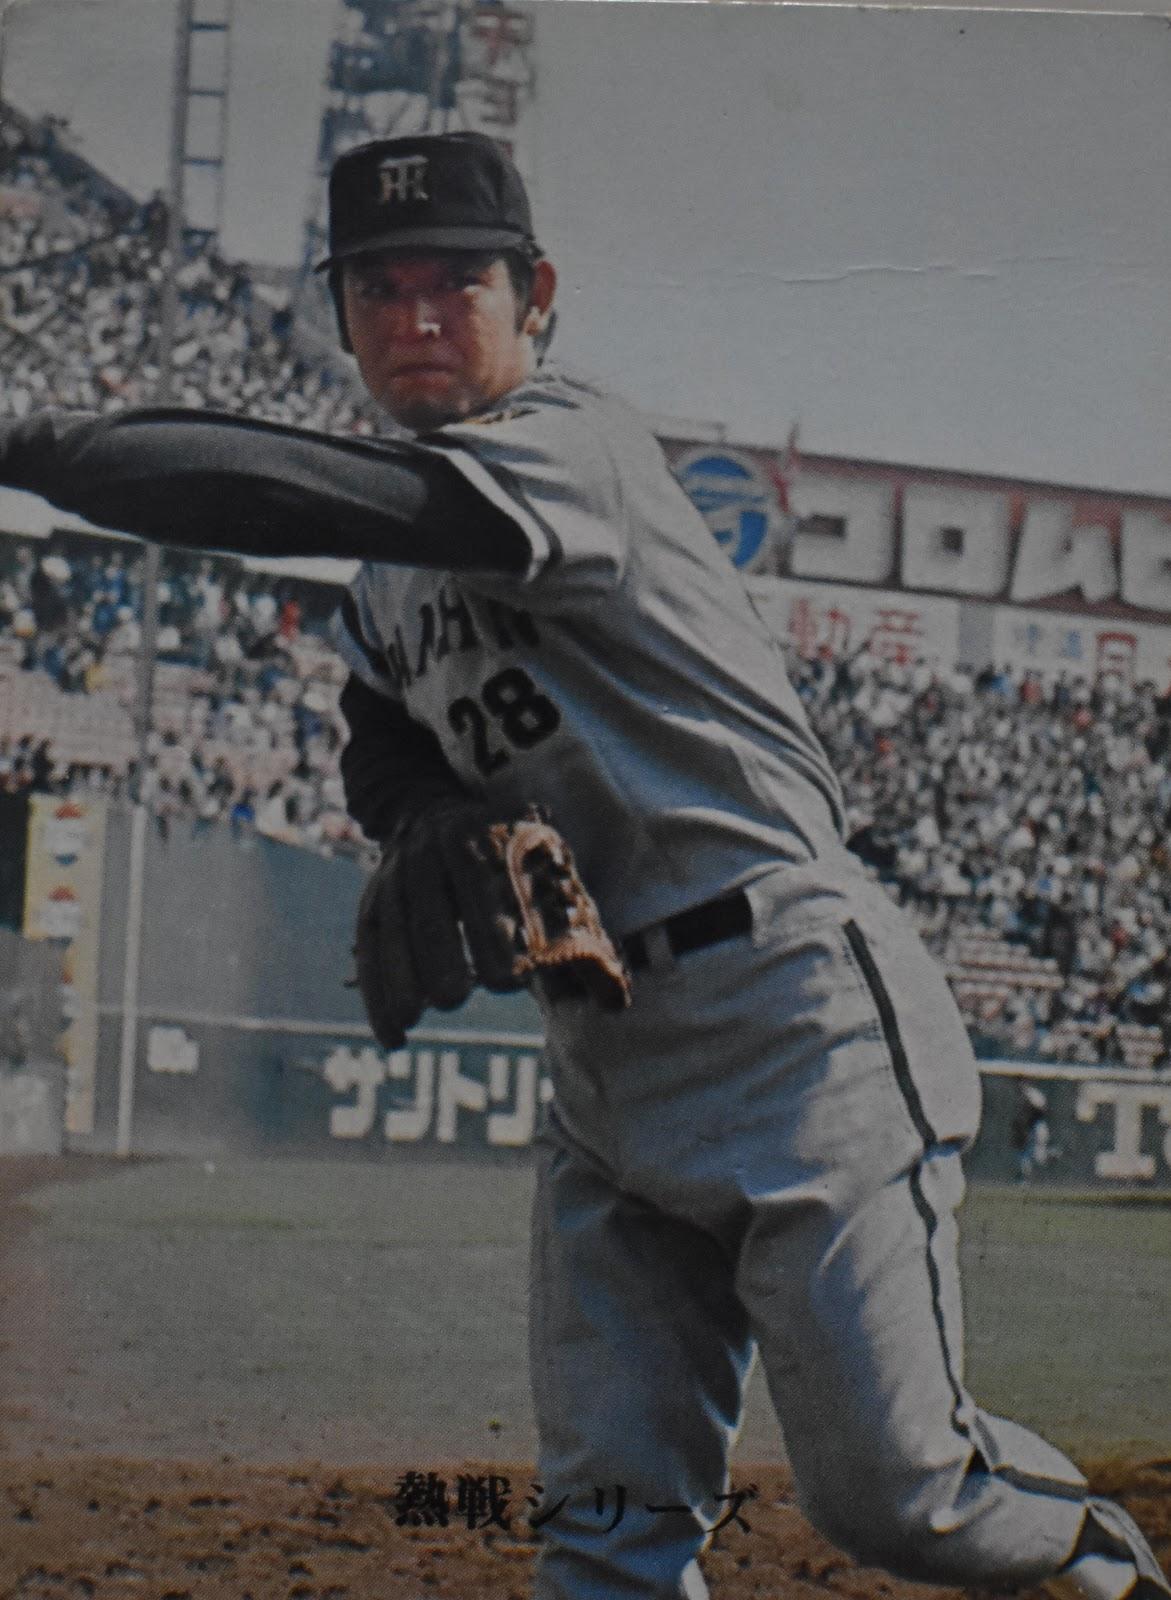 Getting Back Into Baseball Cardsin Japan 2019